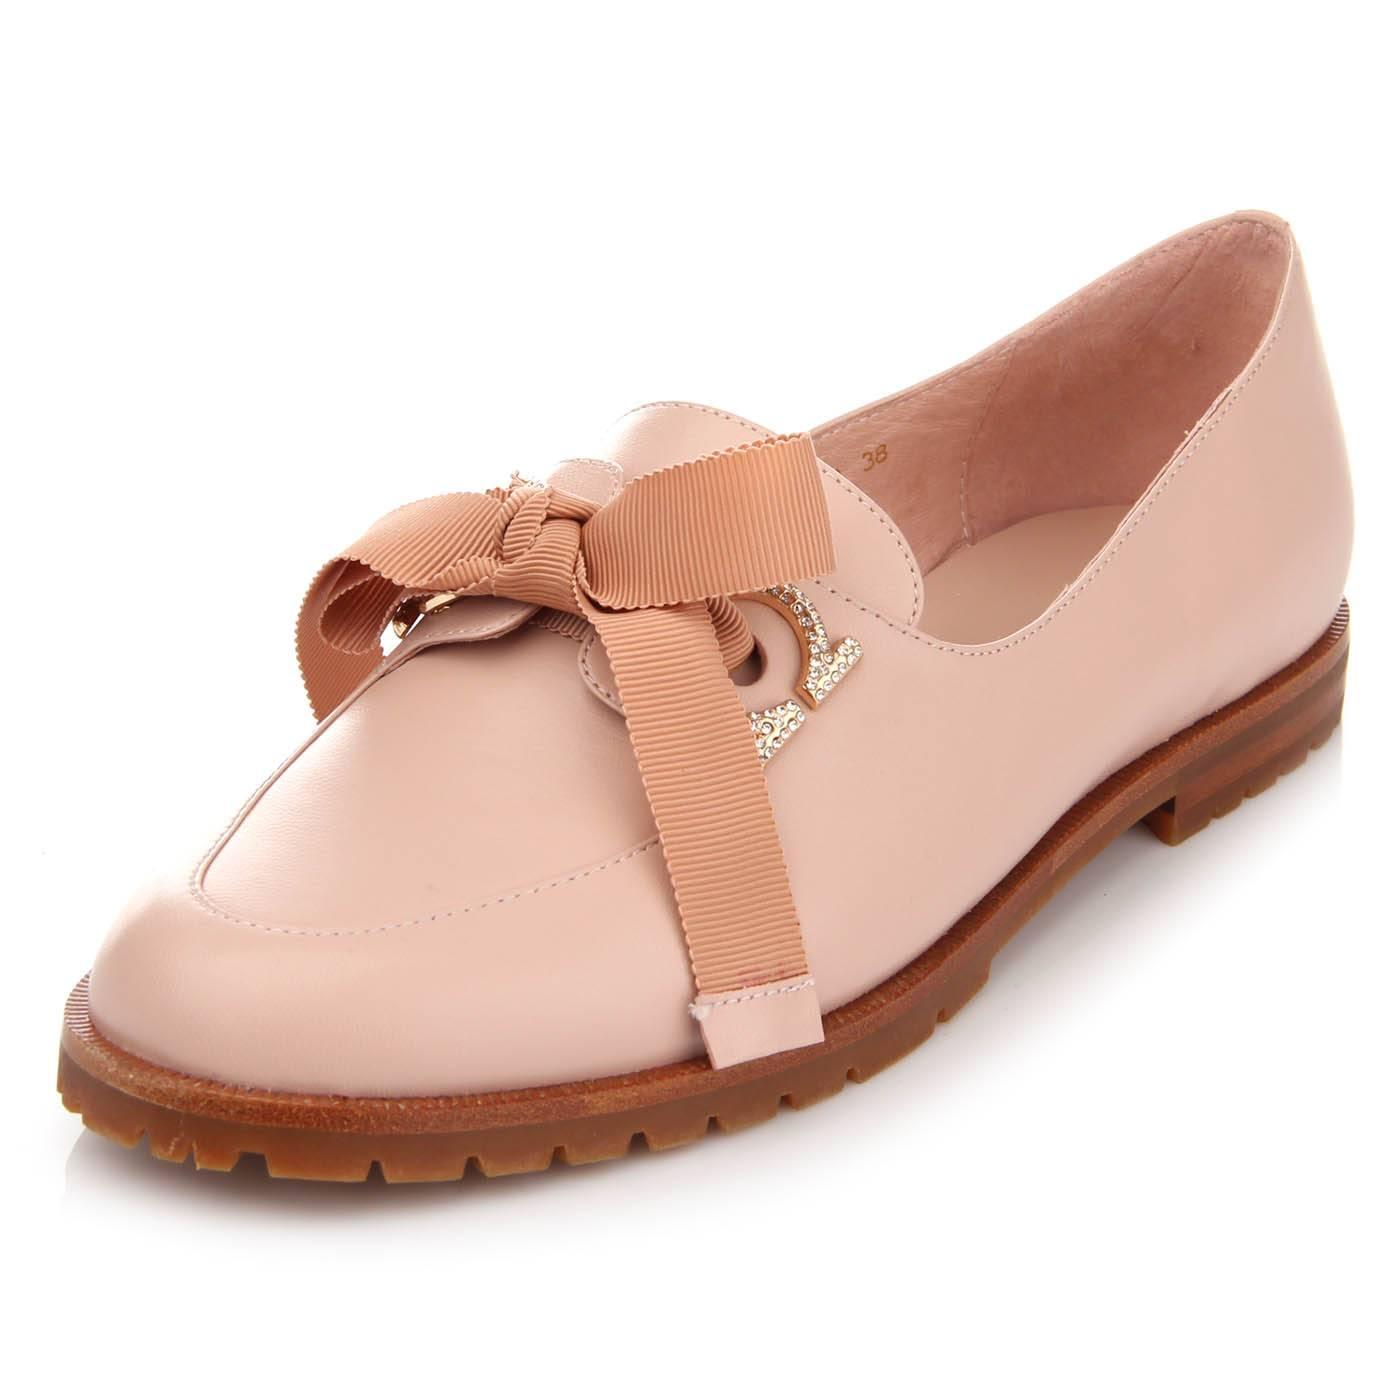 Туфлі жіночі ditto 6519 Рожевий купить по выгодной цене в интернет ... 34f9a1948943e